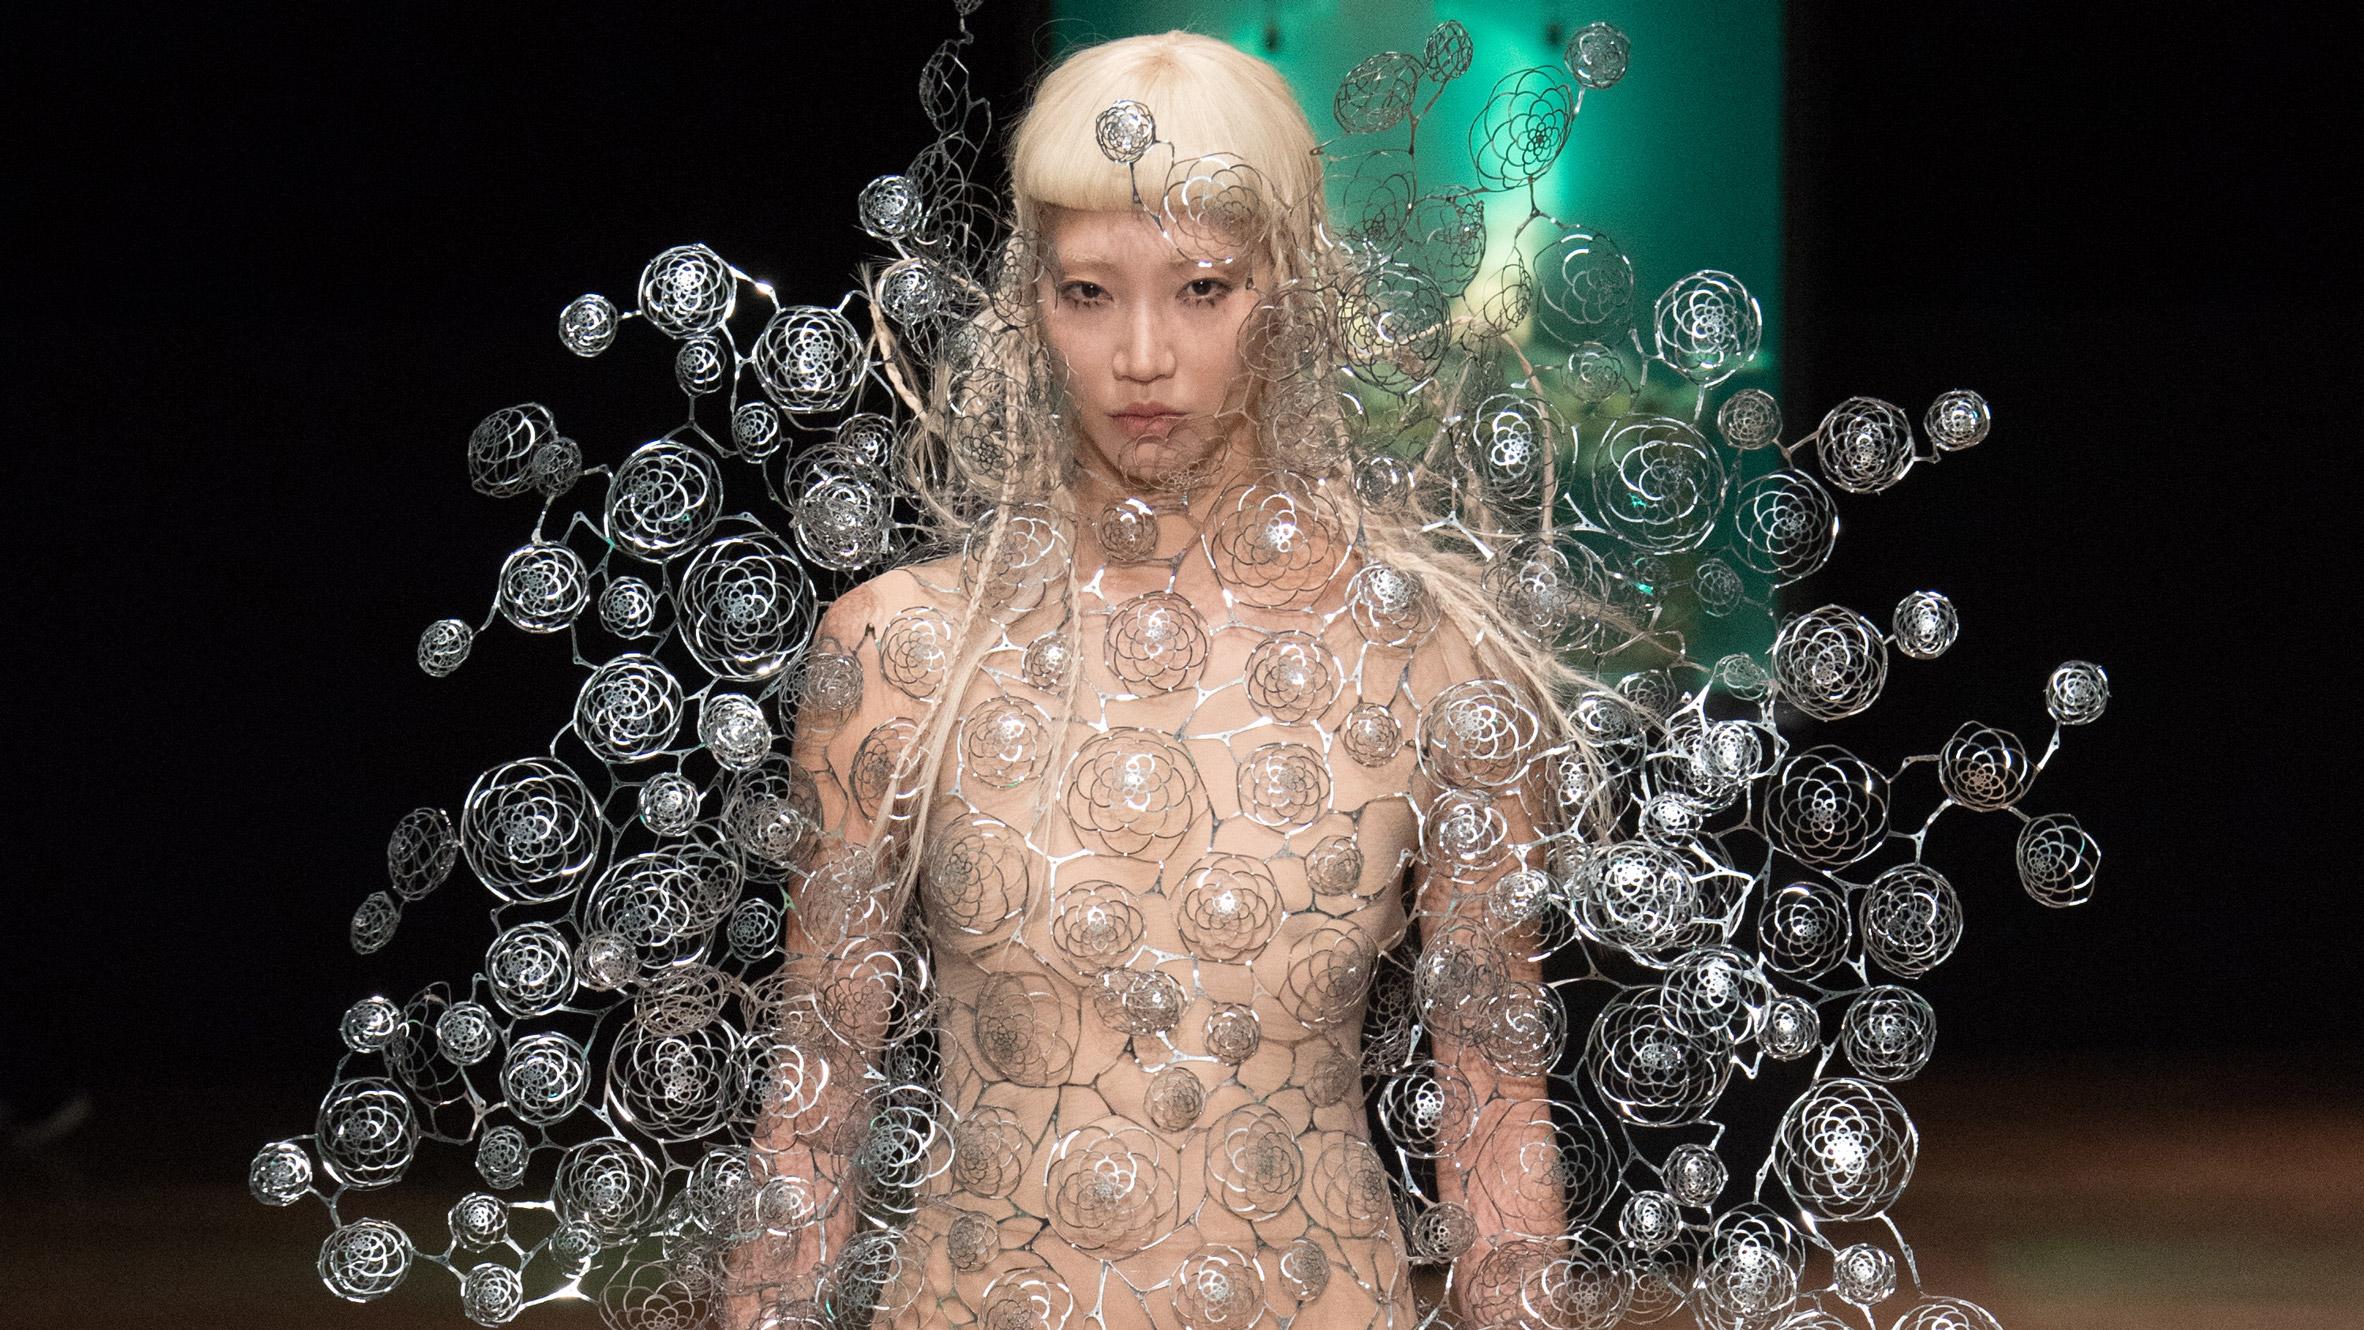 iris-van-herpen-couture-aw17-design-fashion-_dezeen_hero2